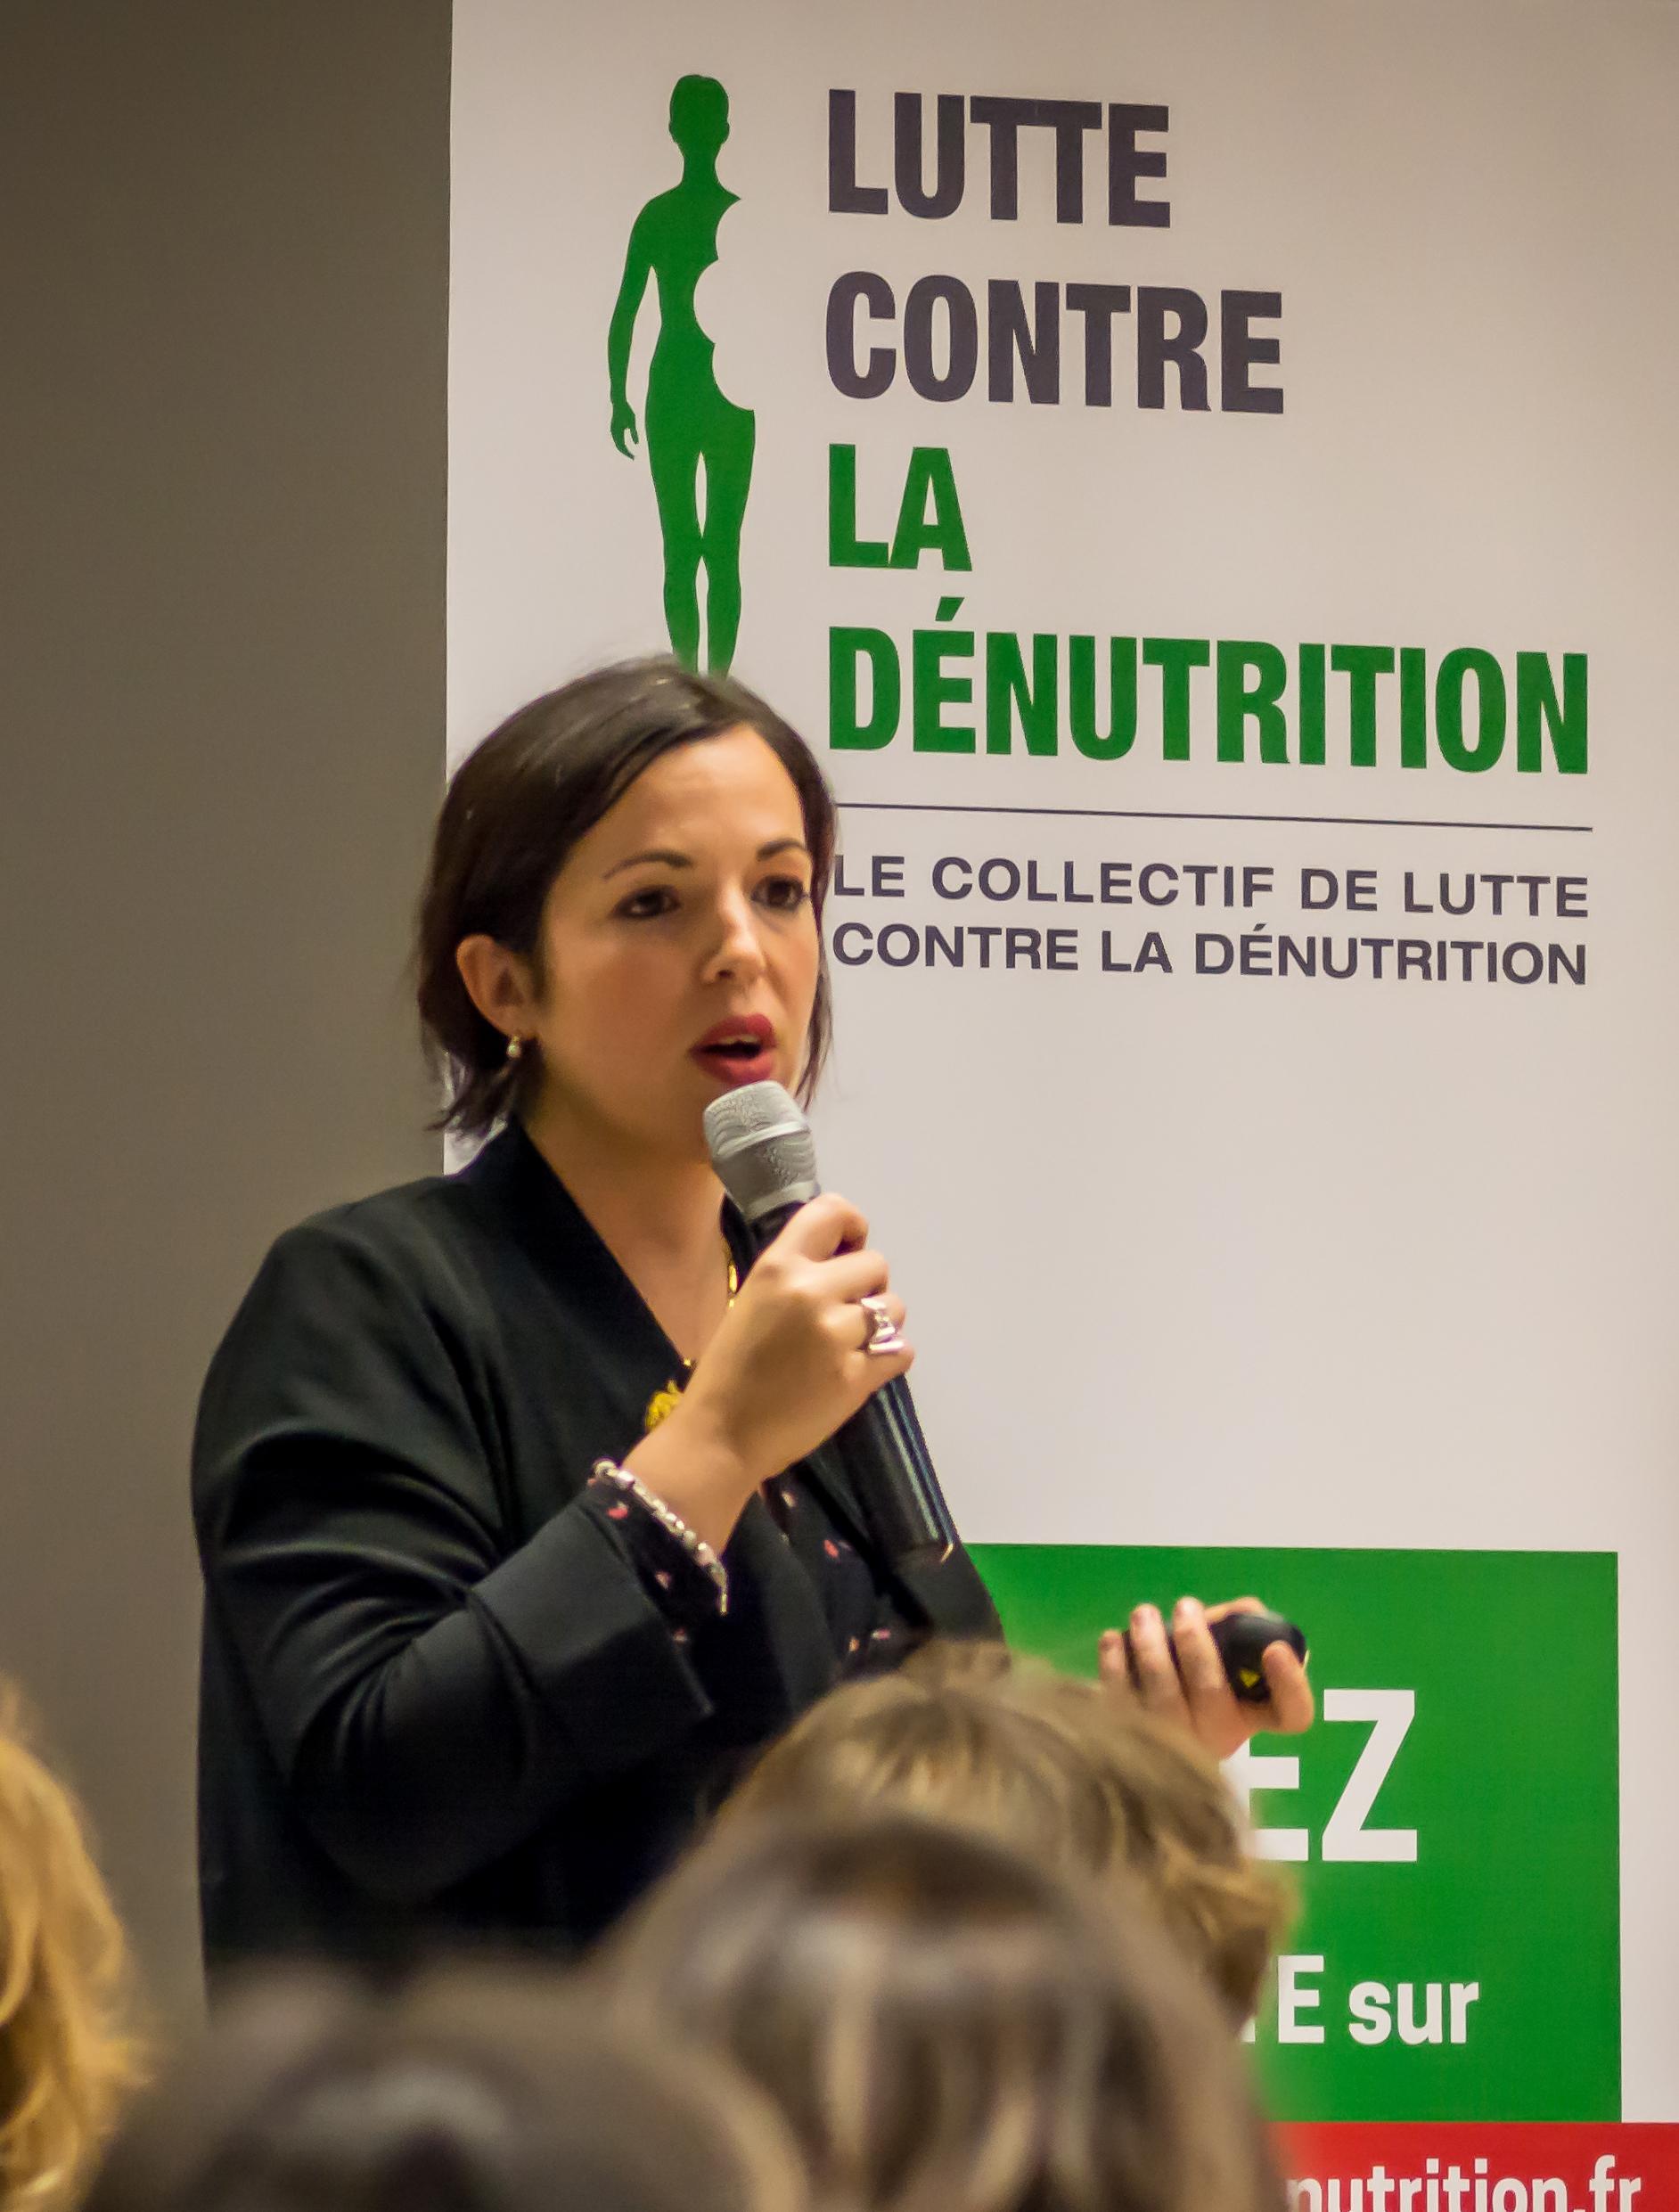 Photo Clémentine HUGOL-GENTIAL